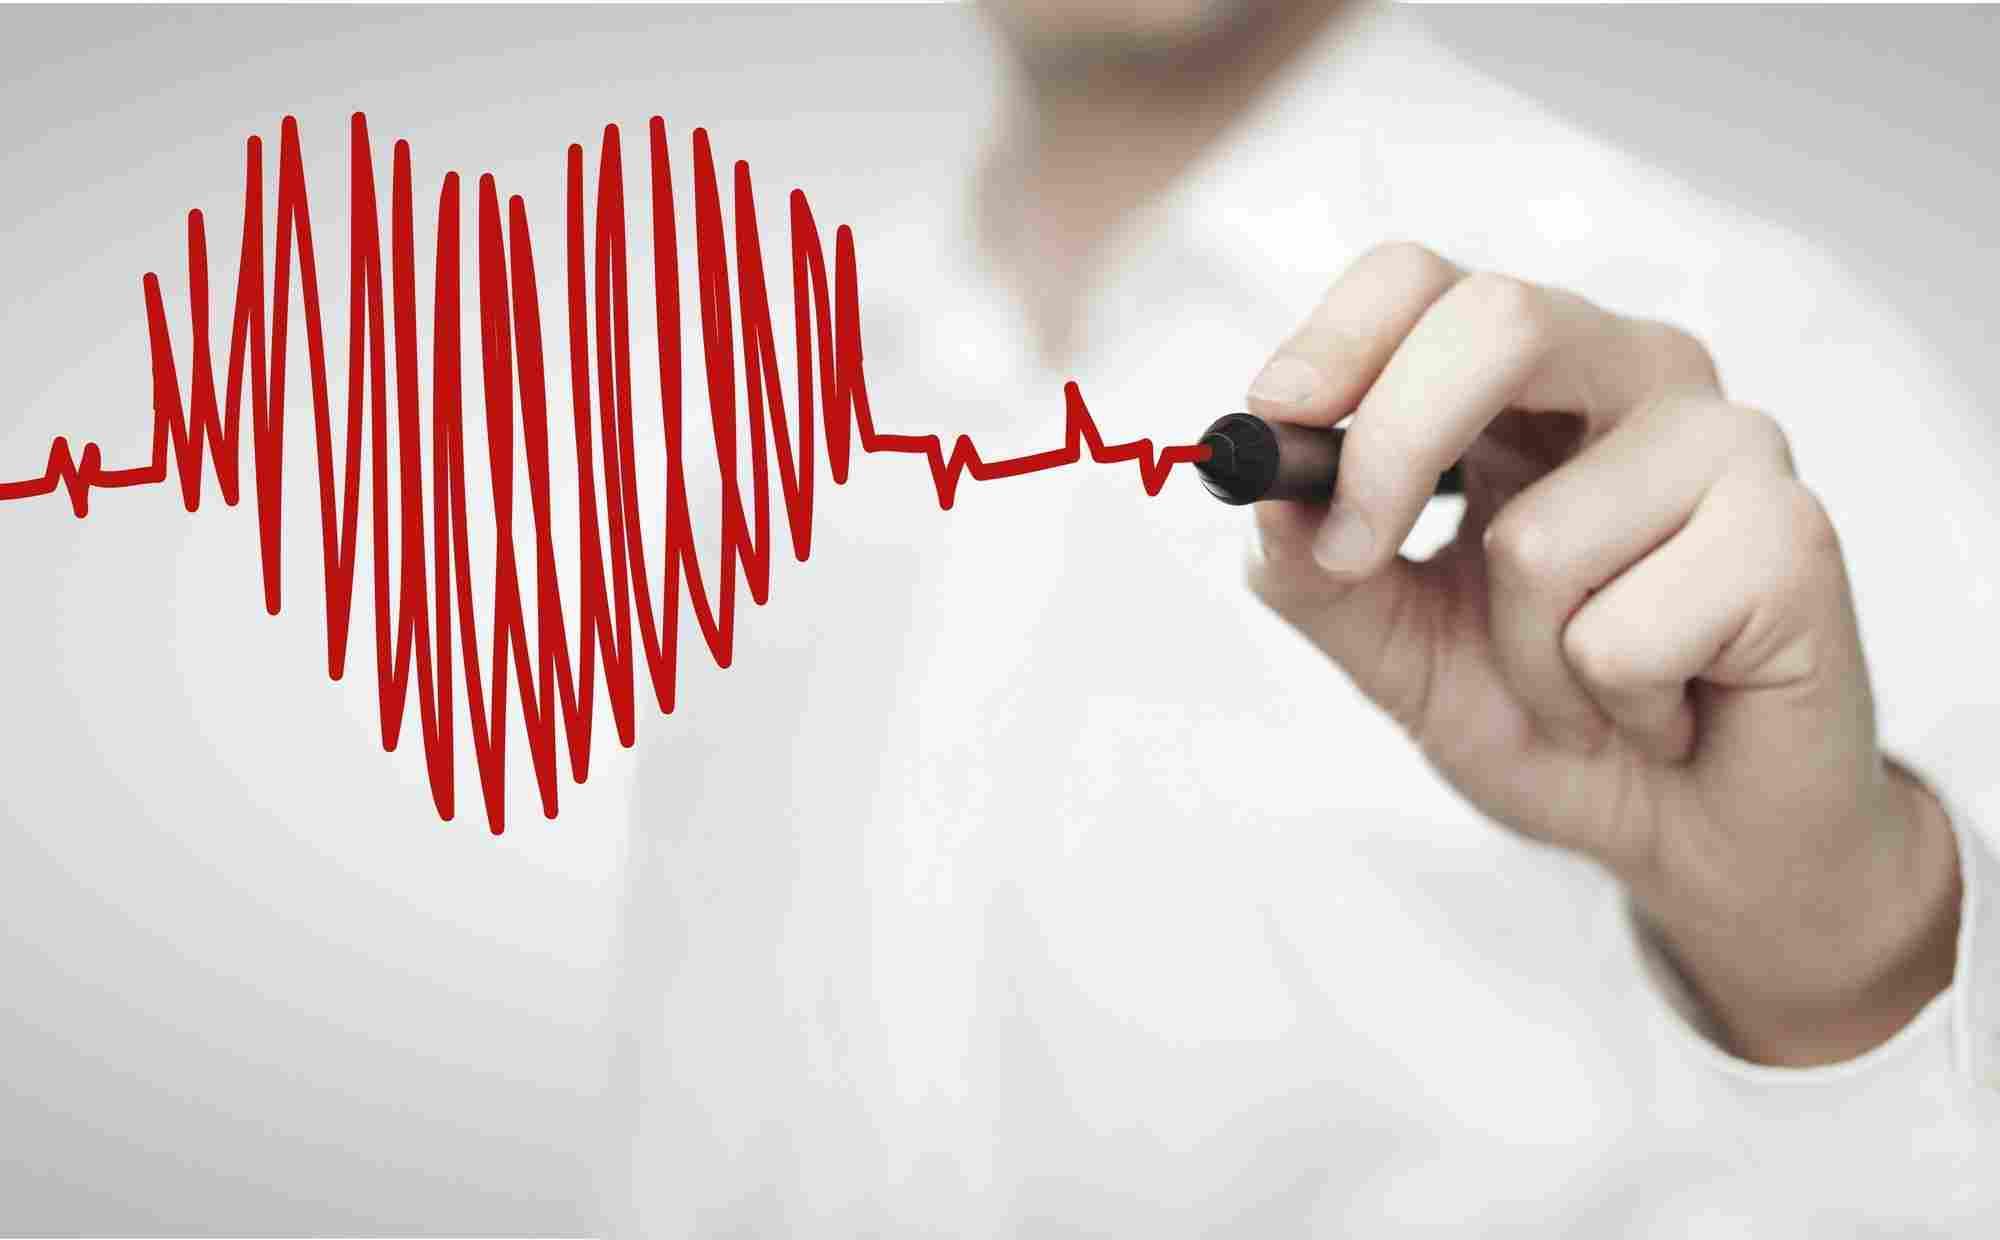 http://www.michelefalco.eu/wp-content/uploads/2015/12/heart-health-1.jpg